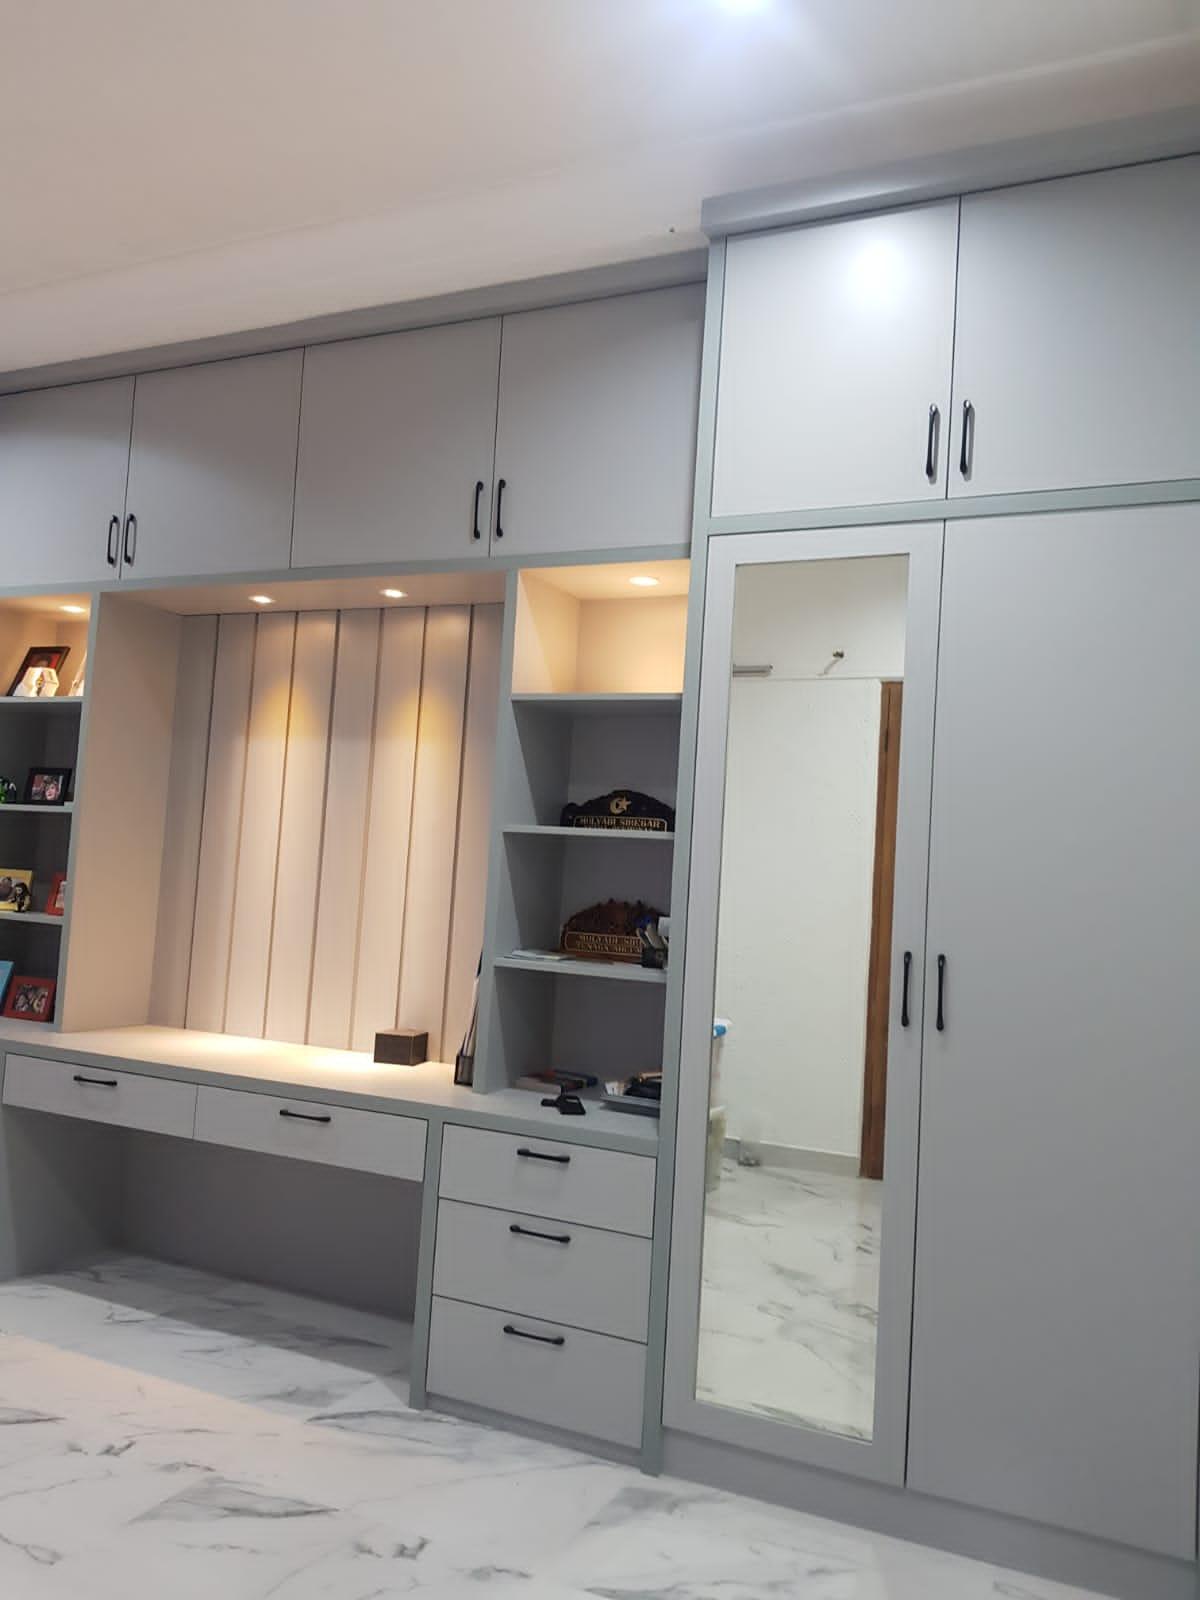 Project Belia Kitchen Set - Lemari Serbaguna - Pondok Indah - Ibu Tyaimage00005